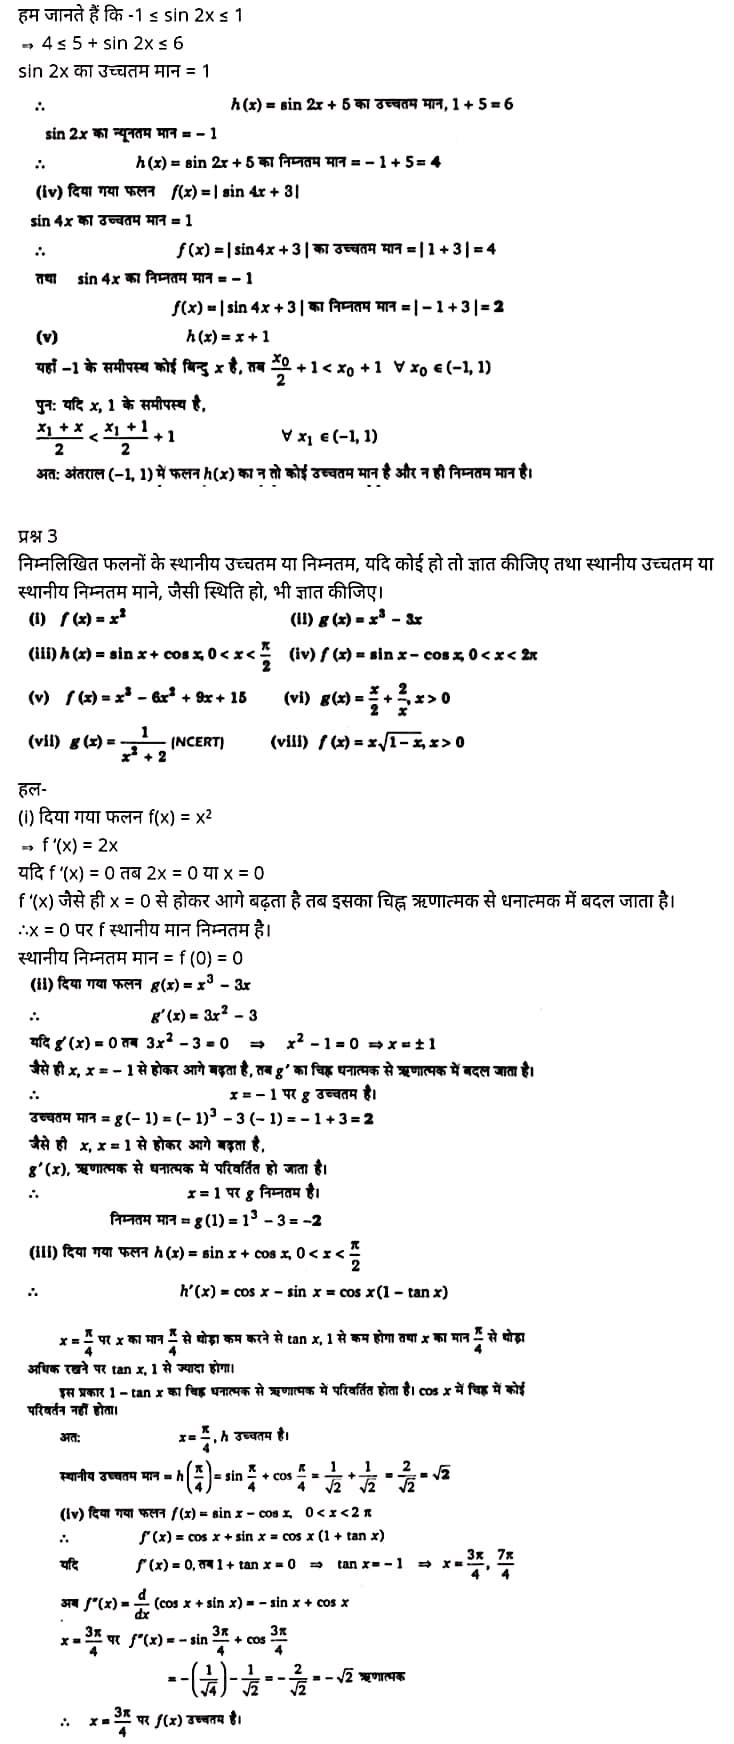 """Class 12 Maths Chapter 6"", ""Application of Derivatives"", Hindi Medium,  मैथ्स कक्षा 12 नोट्स pdf,  मैथ्स कक्षा 12 नोट्स 2020 NCERT,  मैथ्स कक्षा 12 PDF,  मैथ्स पुस्तक,  मैथ्स की बुक,  मैथ्स प्रश्नोत्तरी Class 12, 12 वीं मैथ्स पुस्तक RBSE,  बिहार बोर्ड 12 वीं मैथ्स नोट्स,   12th Maths book in hindi,12th Maths notes in hindi,cbse books for class 12,cbse books in hindi,cbse ncert books,class 12 Maths notes in hindi,class 12 hindi ncert solutions,Maths 2020,Maths 2021,Maths 2022,Maths book class 12,Maths book in hindi,Maths class 12 in hindi,Maths notes for class 12 up board in hindi,ncert all books,ncert app in hindi,ncert book solution,ncert books class 10,ncert books class 12,ncert books for class 7,ncert books for upsc in hindi,ncert books in hindi class 10,ncert books in hindi for class 12 Maths,ncert books in hindi for class 6,ncert books in hindi pdf,ncert class 12 hindi book,ncert english book,ncert Maths book in hindi,ncert Maths books in hindi pdf,ncert Maths class 12,ncert in hindi,old ncert books in hindi,online ncert books in hindi,up board 12th,up board 12th syllabus,up board class 10 hindi book,up board class 12 books,up board class 12 new syllabus,up Board Maths 2020,up Board Maths 2021,up Board Maths 2022,up Board Maths 2023,up board intermediate Maths syllabus,up board intermediate syllabus 2021,Up board Master 2021,up board model paper 2021,up board model paper all subject,up board new syllabus of class 12th Maths,up board paper 2021,Up board syllabus 2021,UP board syllabus 2022, 12 वीं मैथ्स पुस्तक हिंदी में, 12 वीं मैथ्स नोट्स हिंदी में, कक्षा 12 के लिए सीबीएससी पुस्तकें, हिंदी में सीबीएससी पुस्तकें, सीबीएससी  पुस्तकें, कक्षा 12 मैथ्स नोट्स हिंदी में, कक्षा 12 हिंदी एनसीईआरटी समाधान, मैथ्स 2020, मैथ्स 2021, मैथ्स 2022, मैथ्स  बुक क्लास 12, मैथ्स बुक इन हिंदी, बायोलॉजी क्लास 12 हिंदी में, मैथ्स नोट्स इन क्लास 12 यूपी  बोर्ड इन हिंदी, एनसीईआरटी मैथ्स की किताब हिंदी में,  बोर्ड 12 वीं तक, 12 वीं तक की पाठ्यक्रम, बोर्ड कक्षा 10 की हिंदी पुस्तक  , बोर्ड"